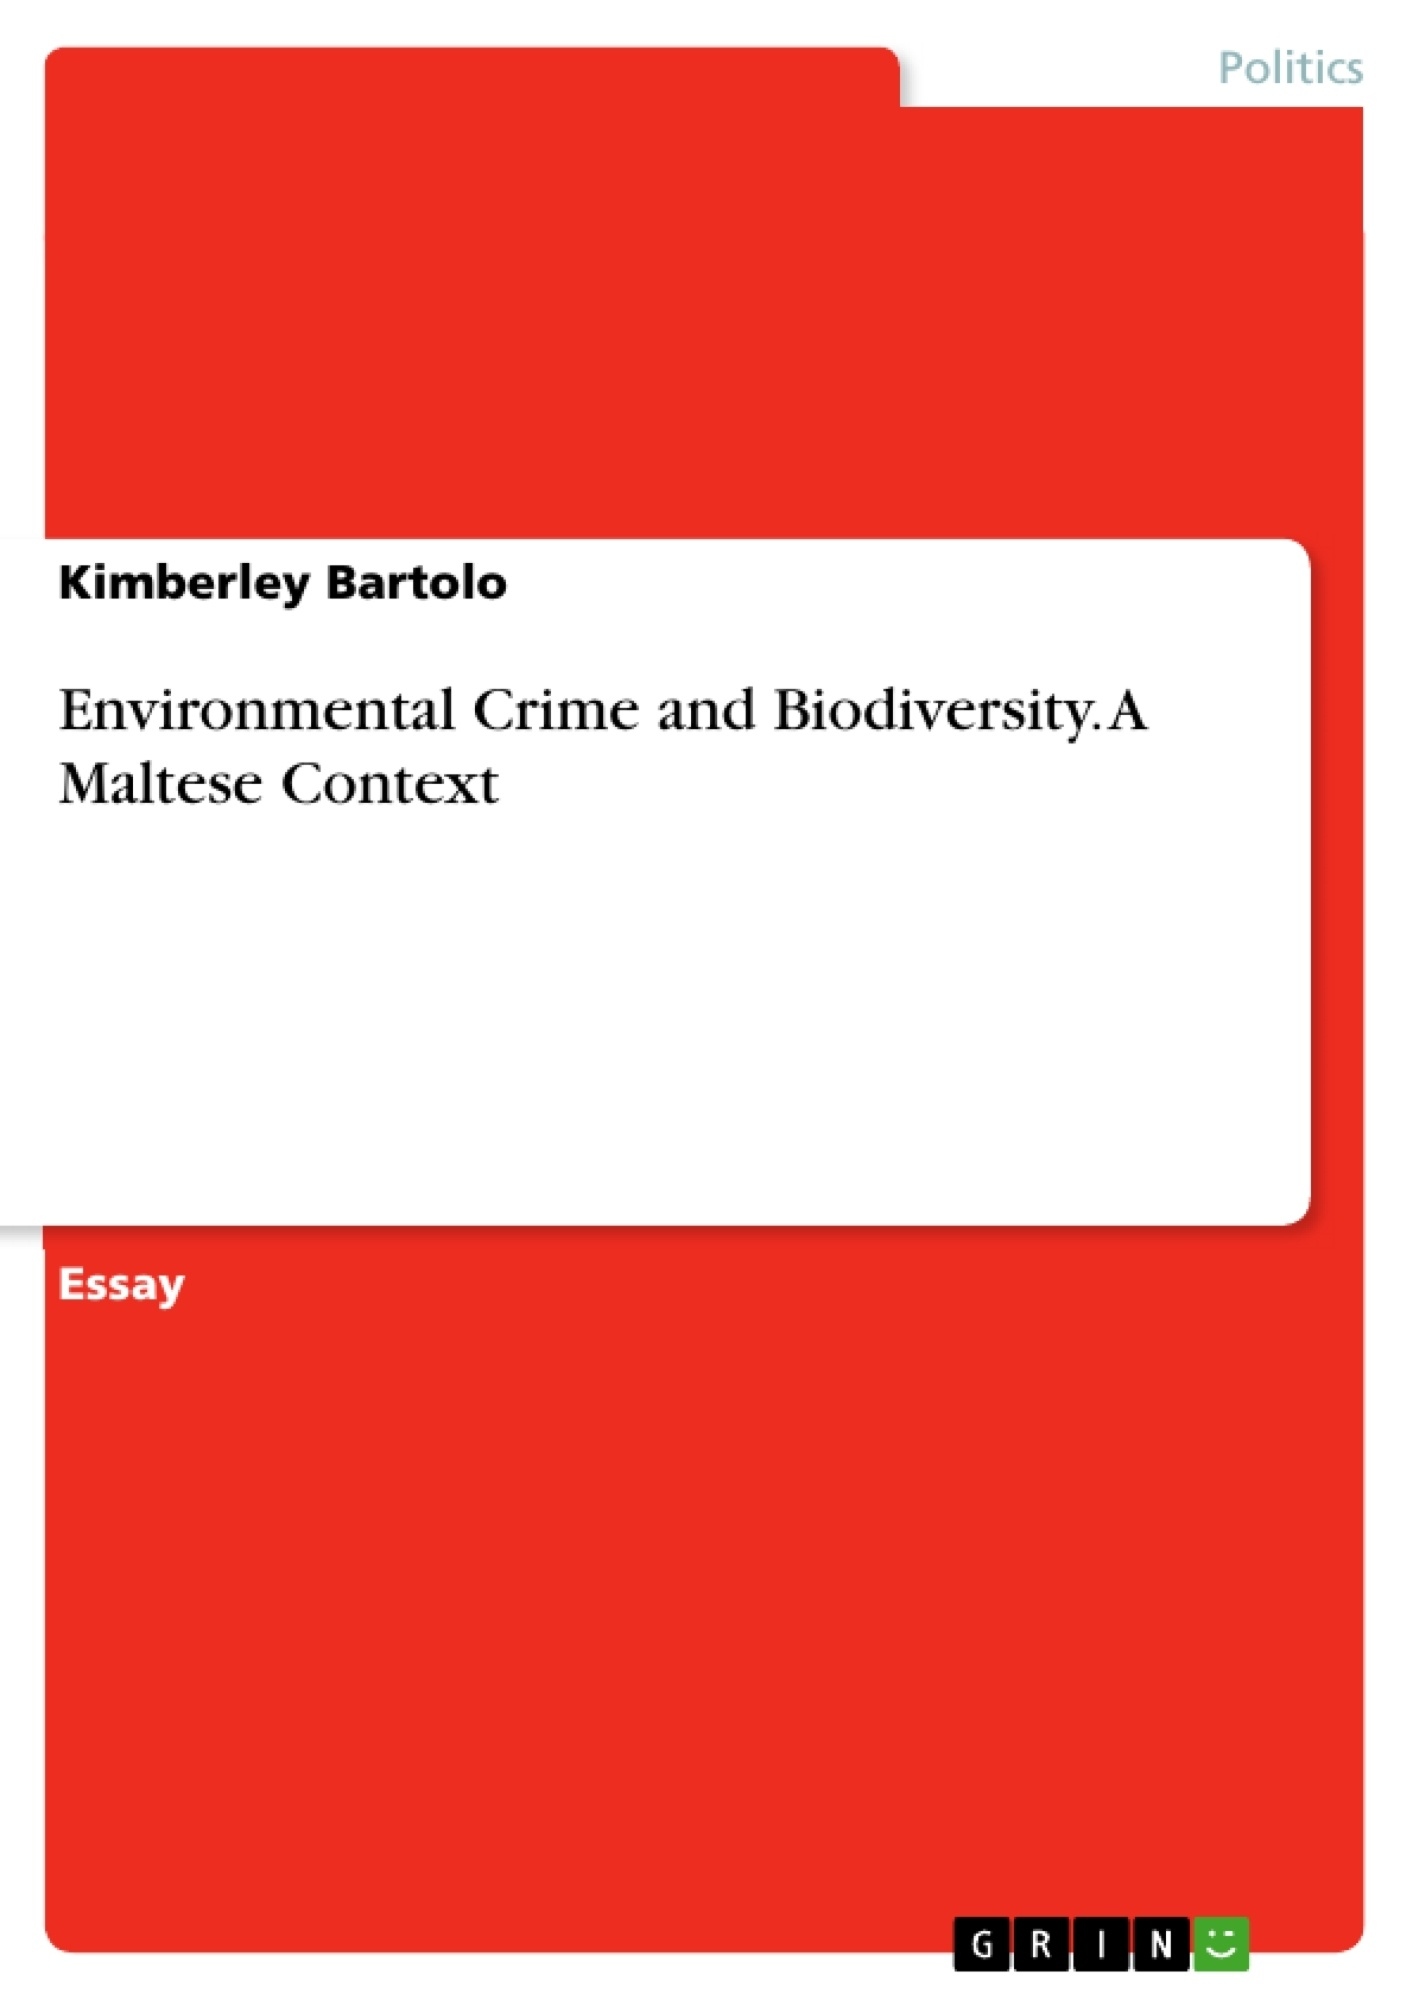 Title: Environmental Crime and Biodiversity. A Maltese Context